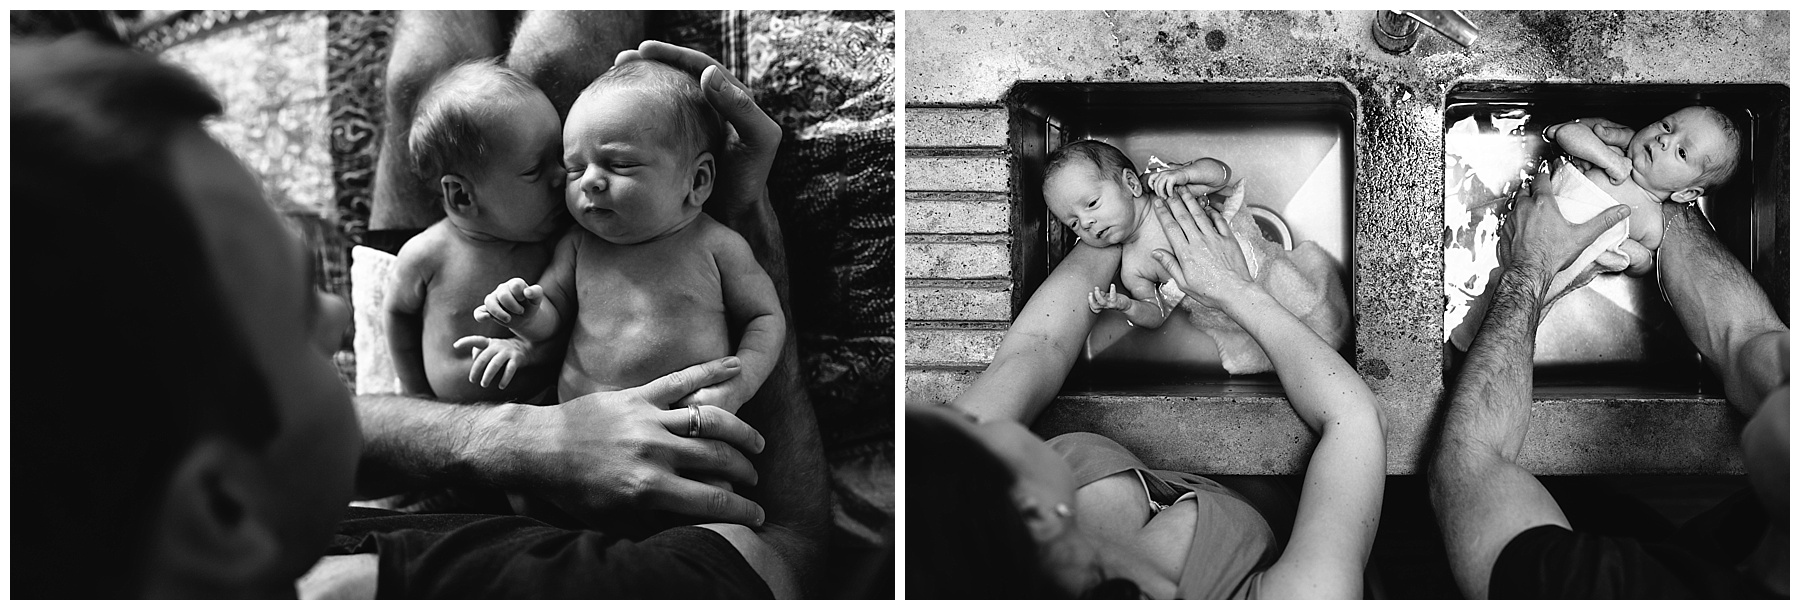 berwick newborn photography - lifestyle - twins